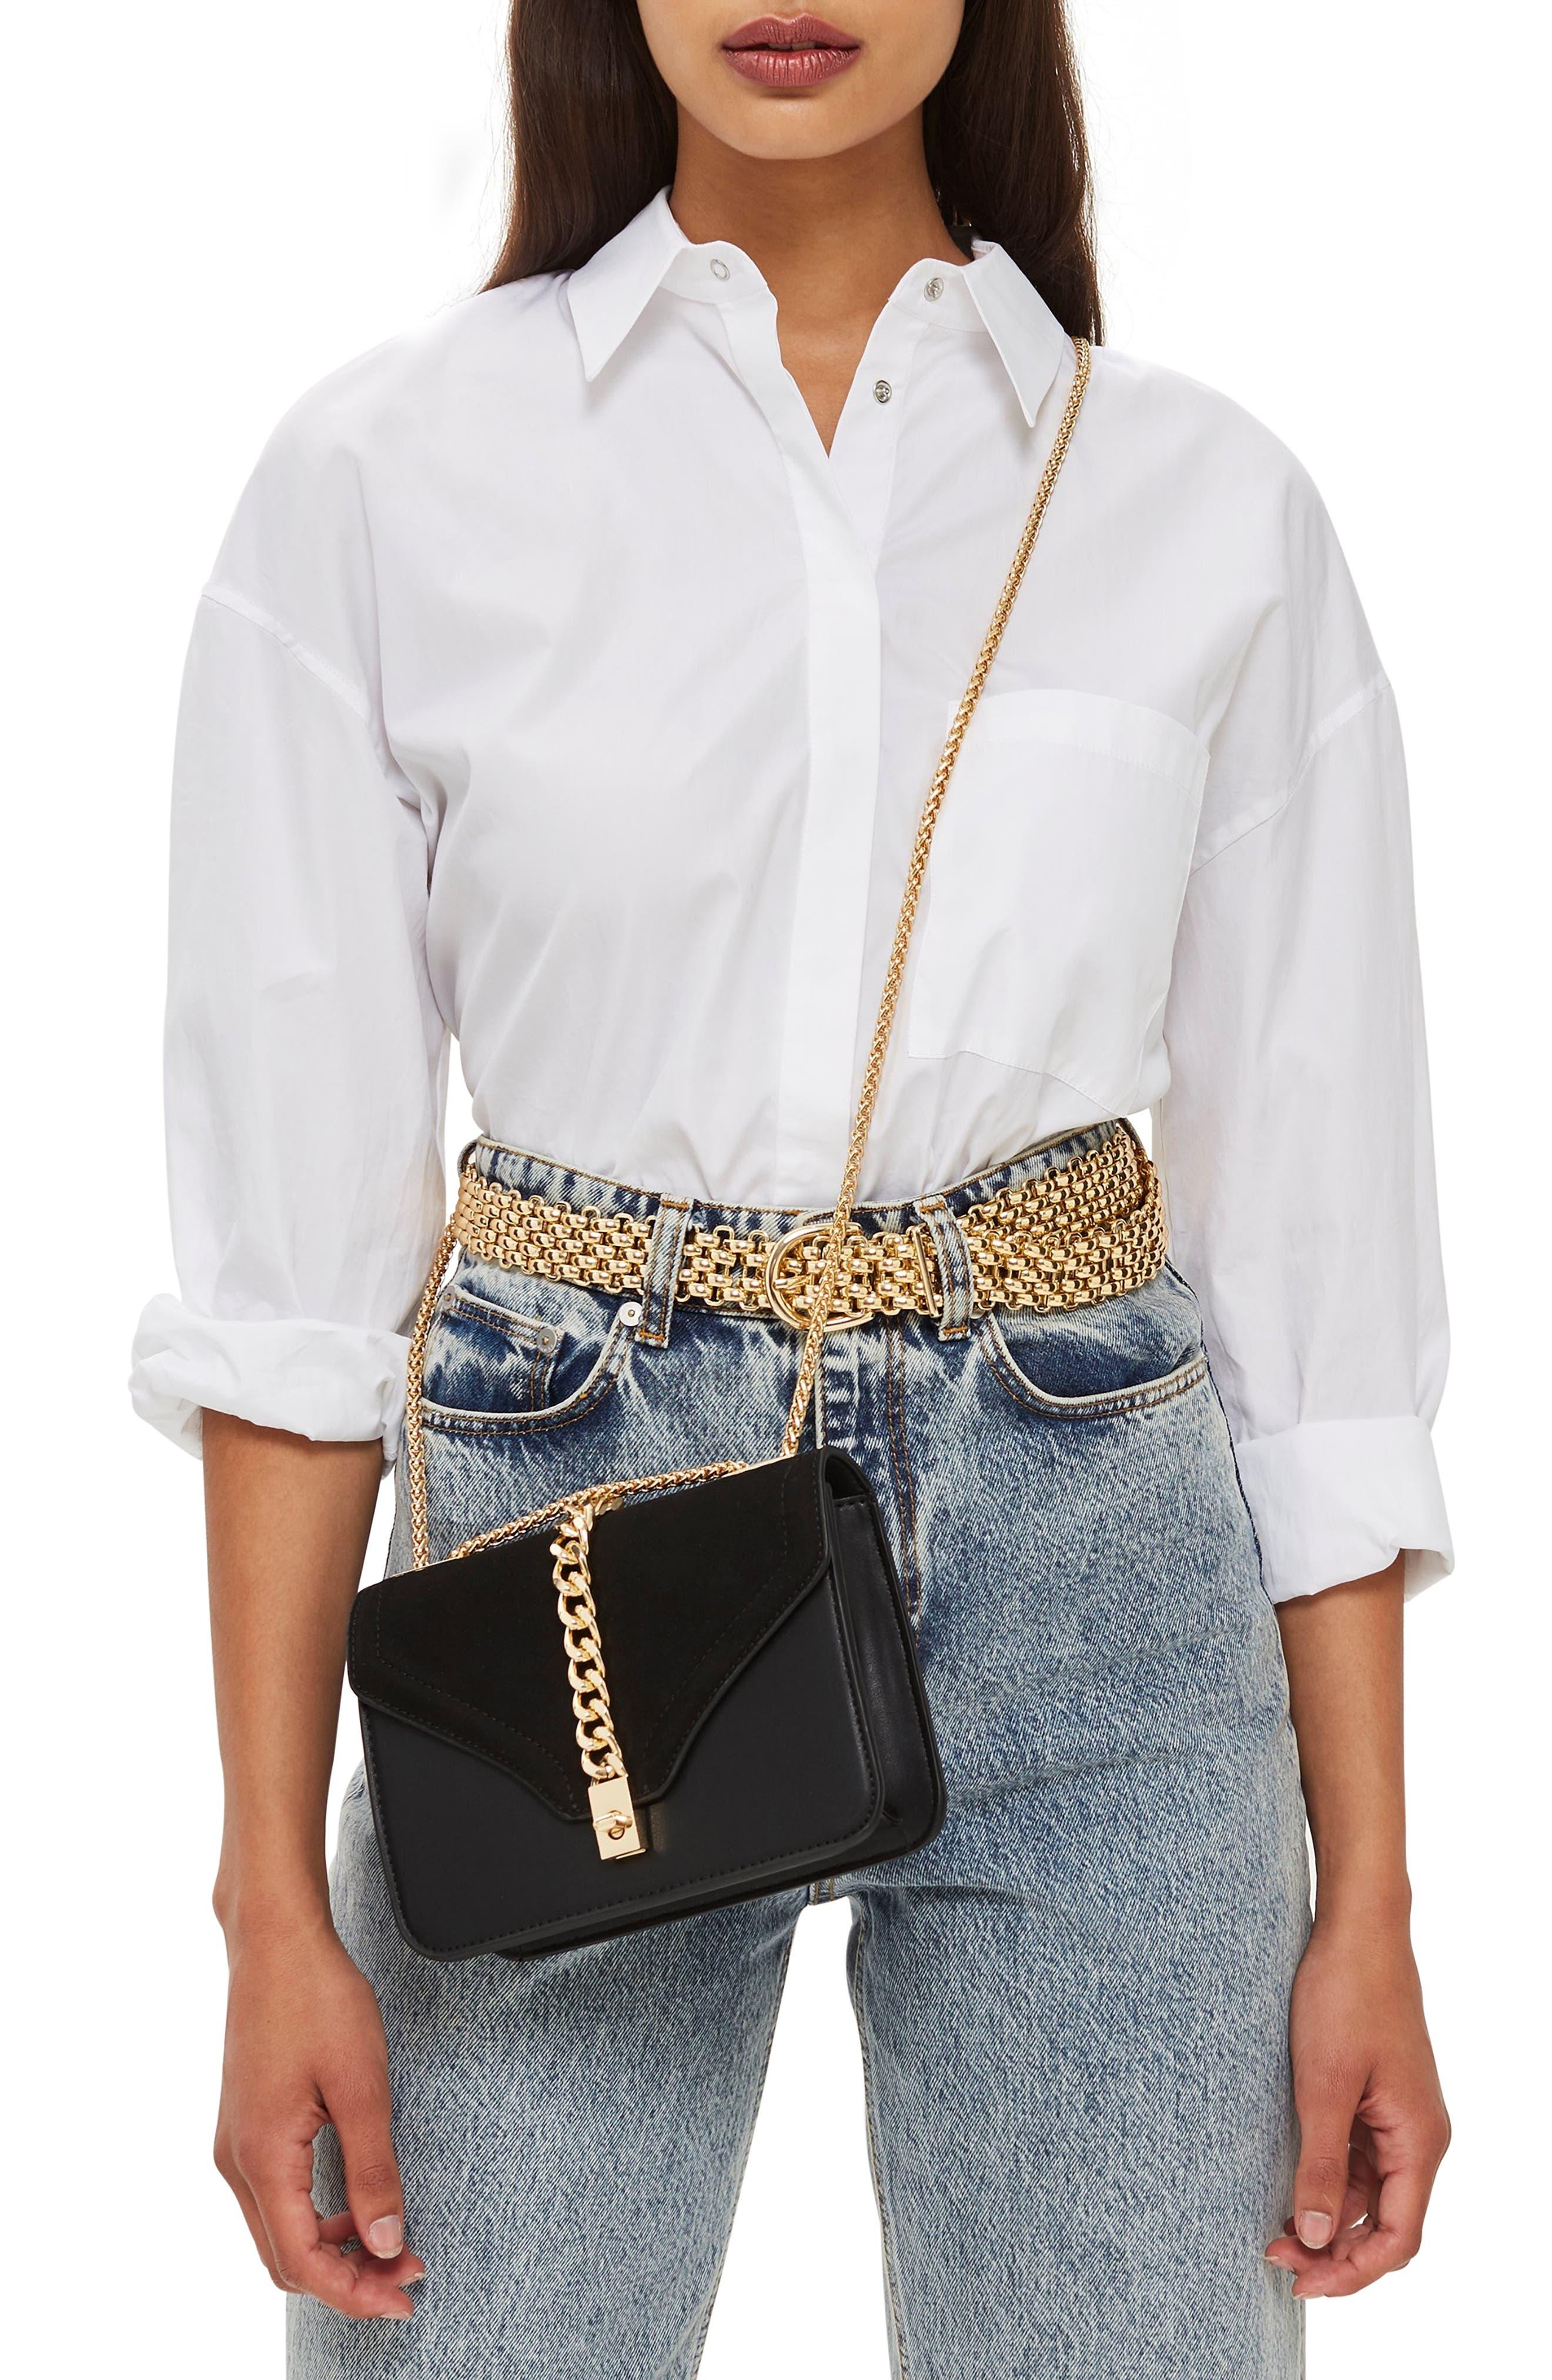 Daisy Chain Faux Leather Crossbody Bag,                             Alternate thumbnail 2, color,                             BLACK MULTI